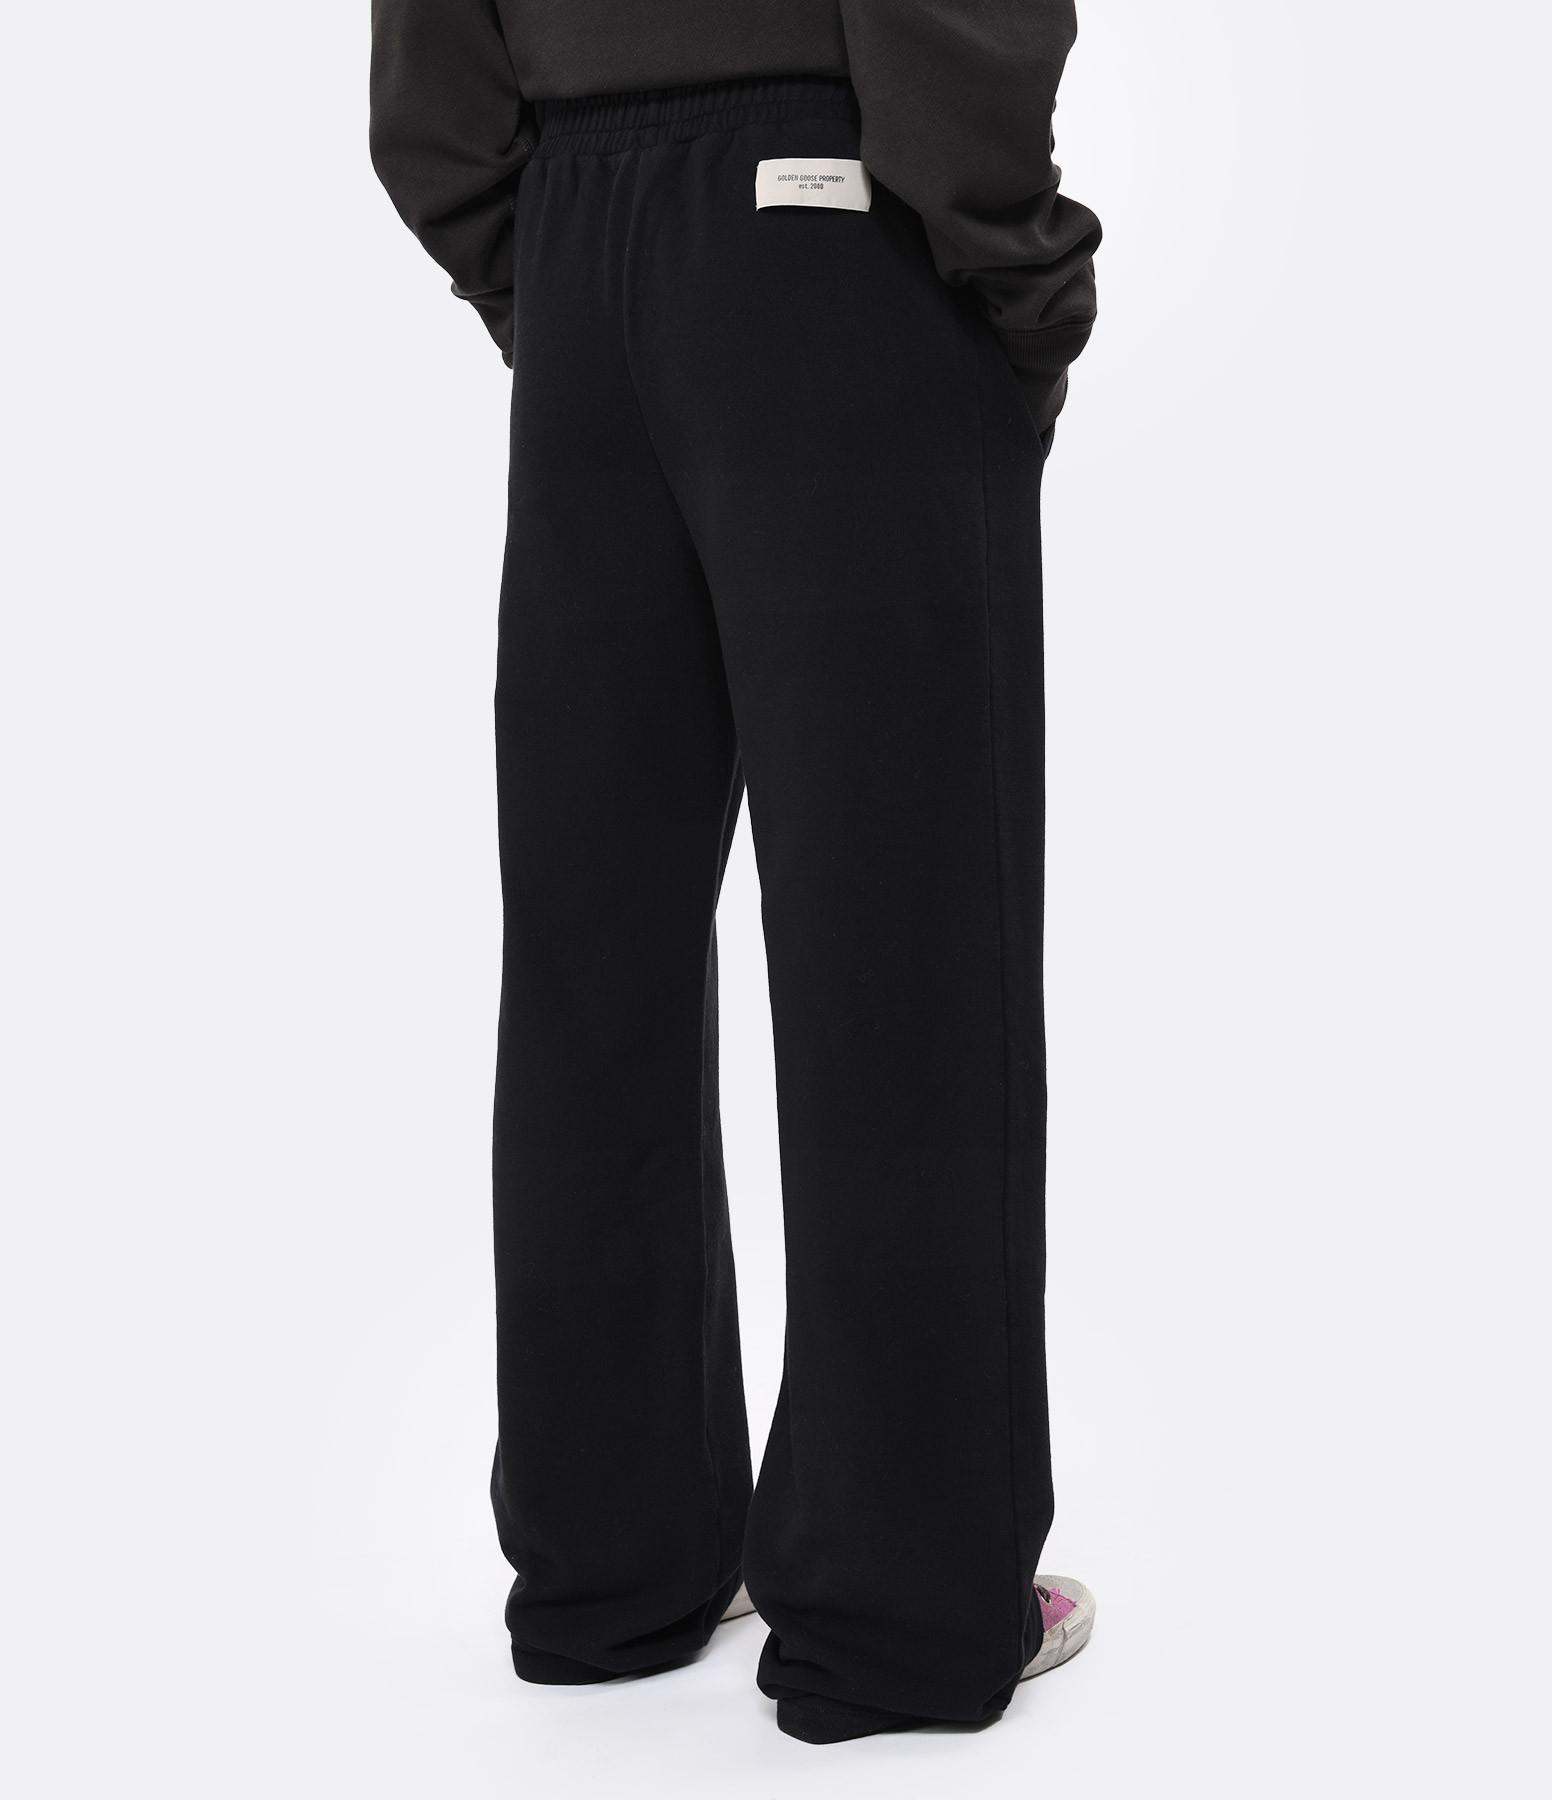 GOLDEN GOOSE - Pantalon Britney Coton Noir